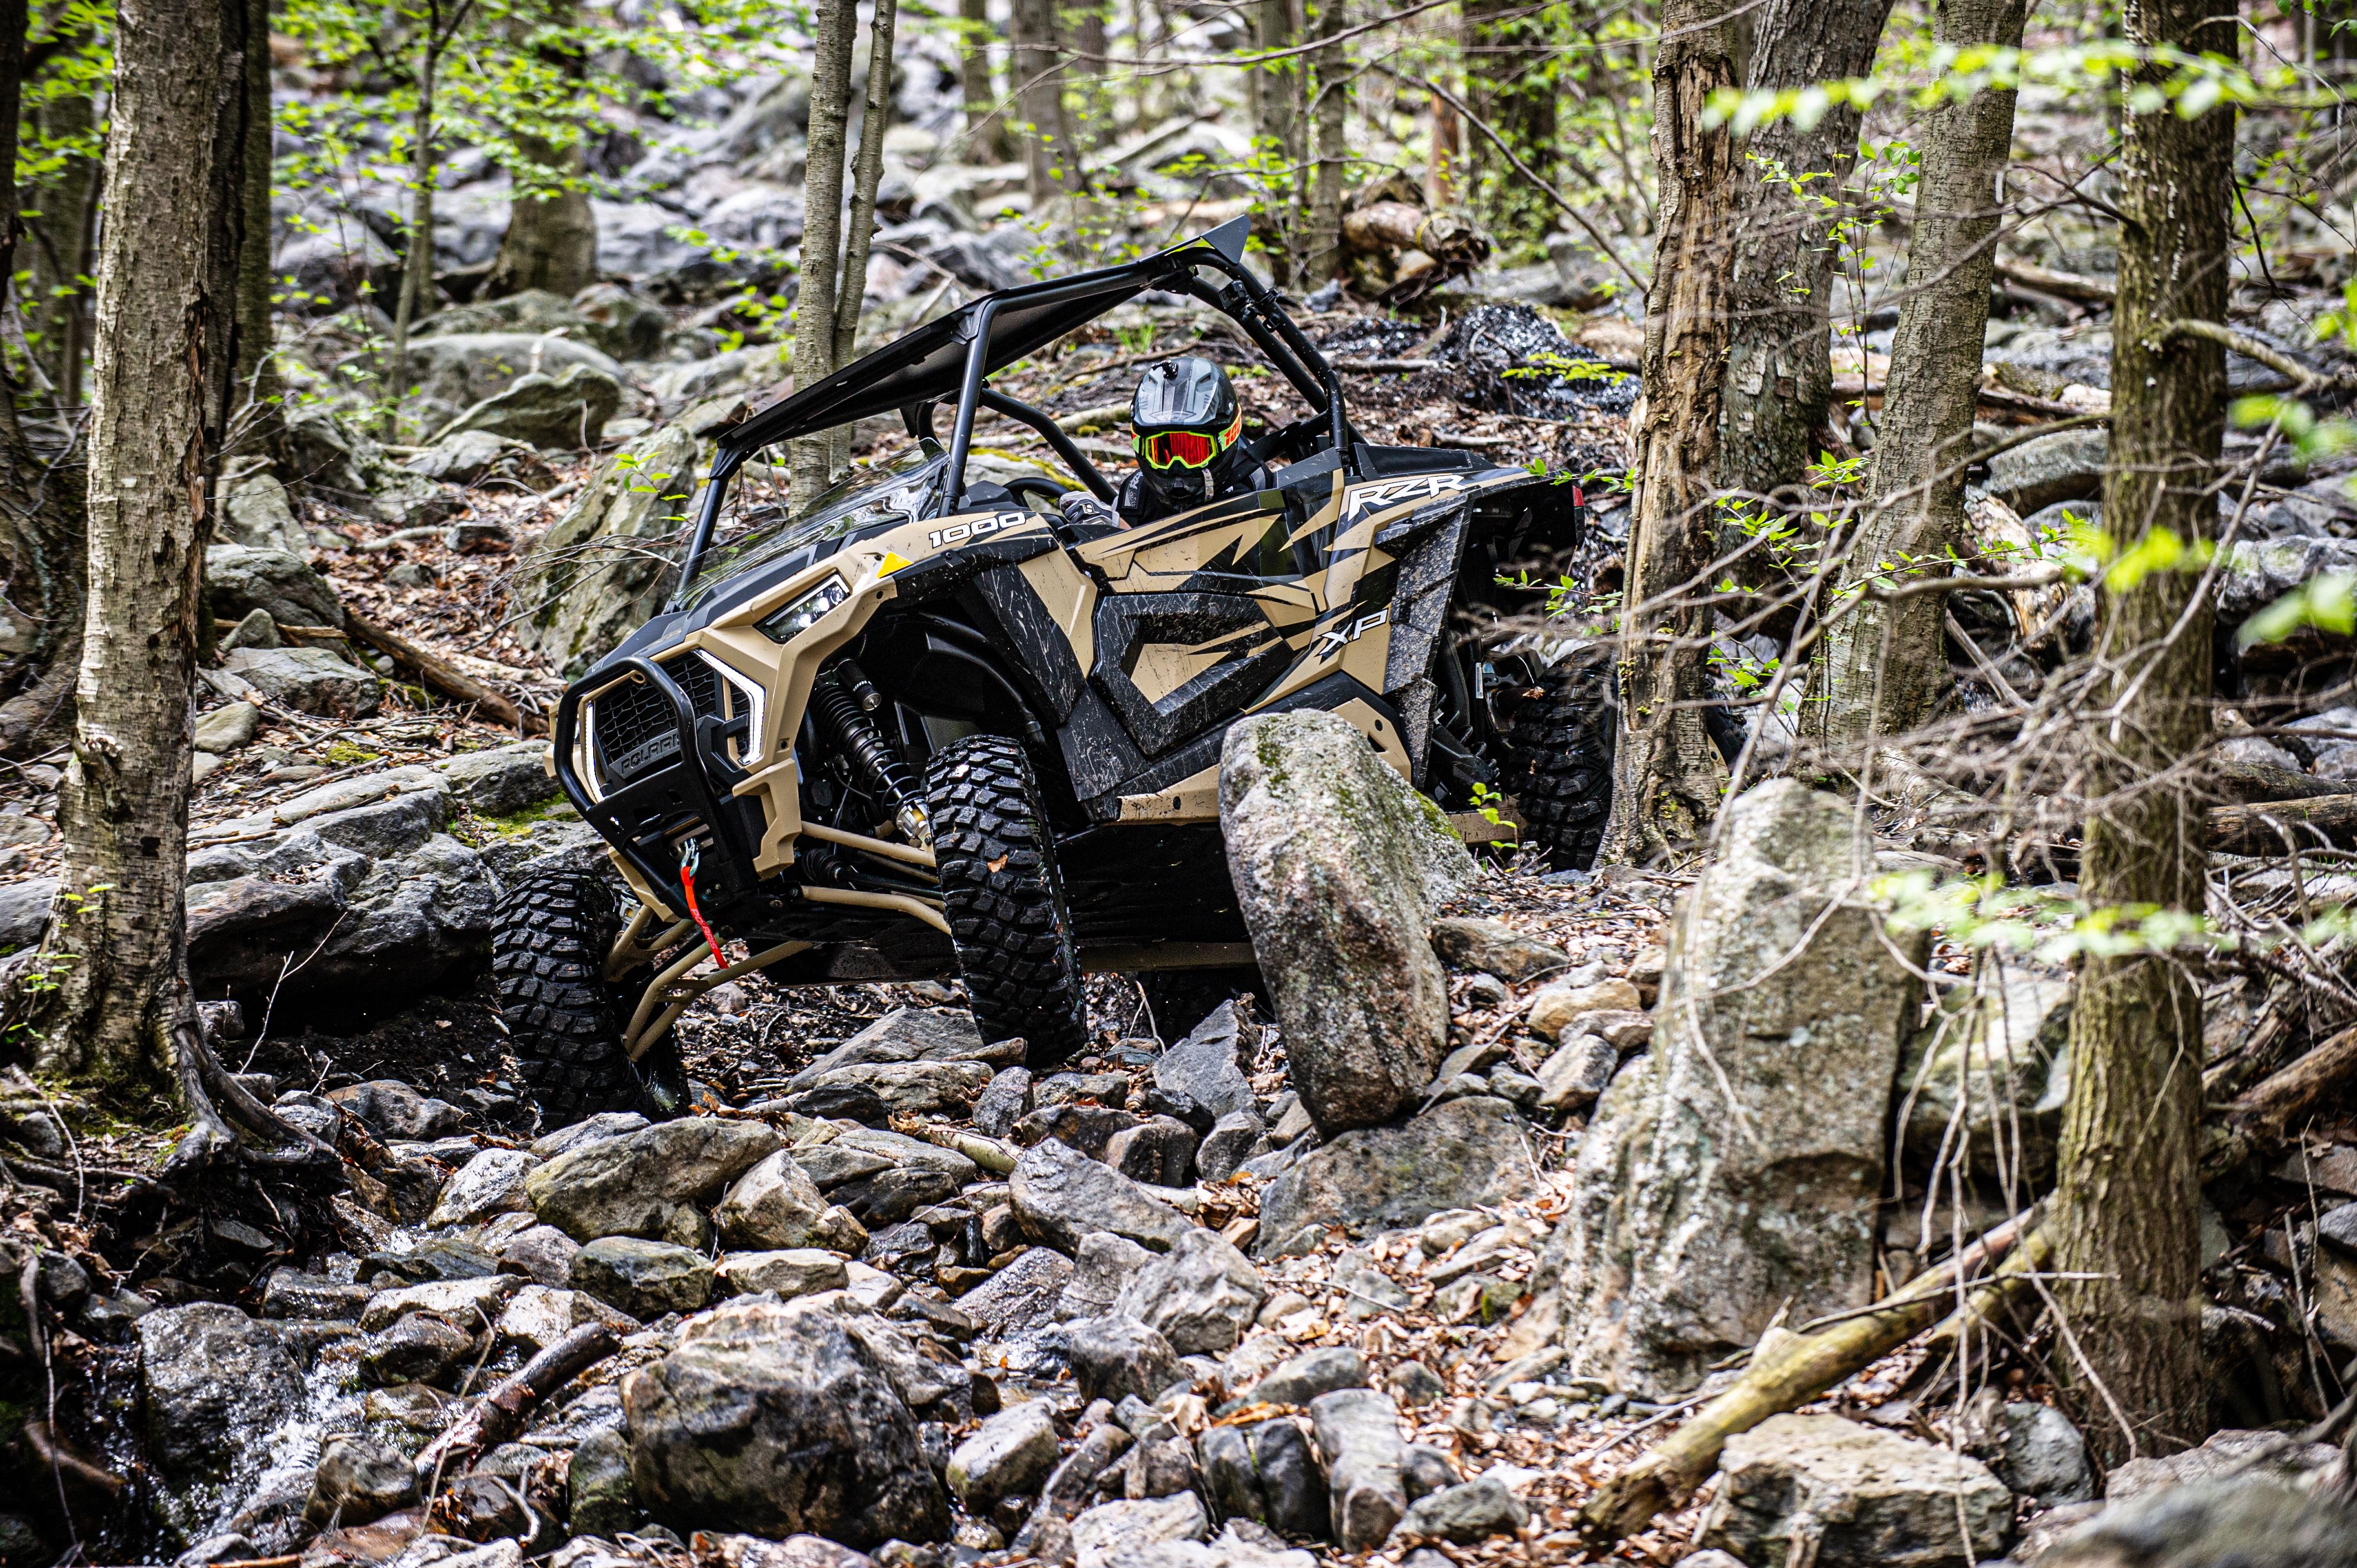 2020 Polaris RZR XP 1000 Trails & Rocks Review